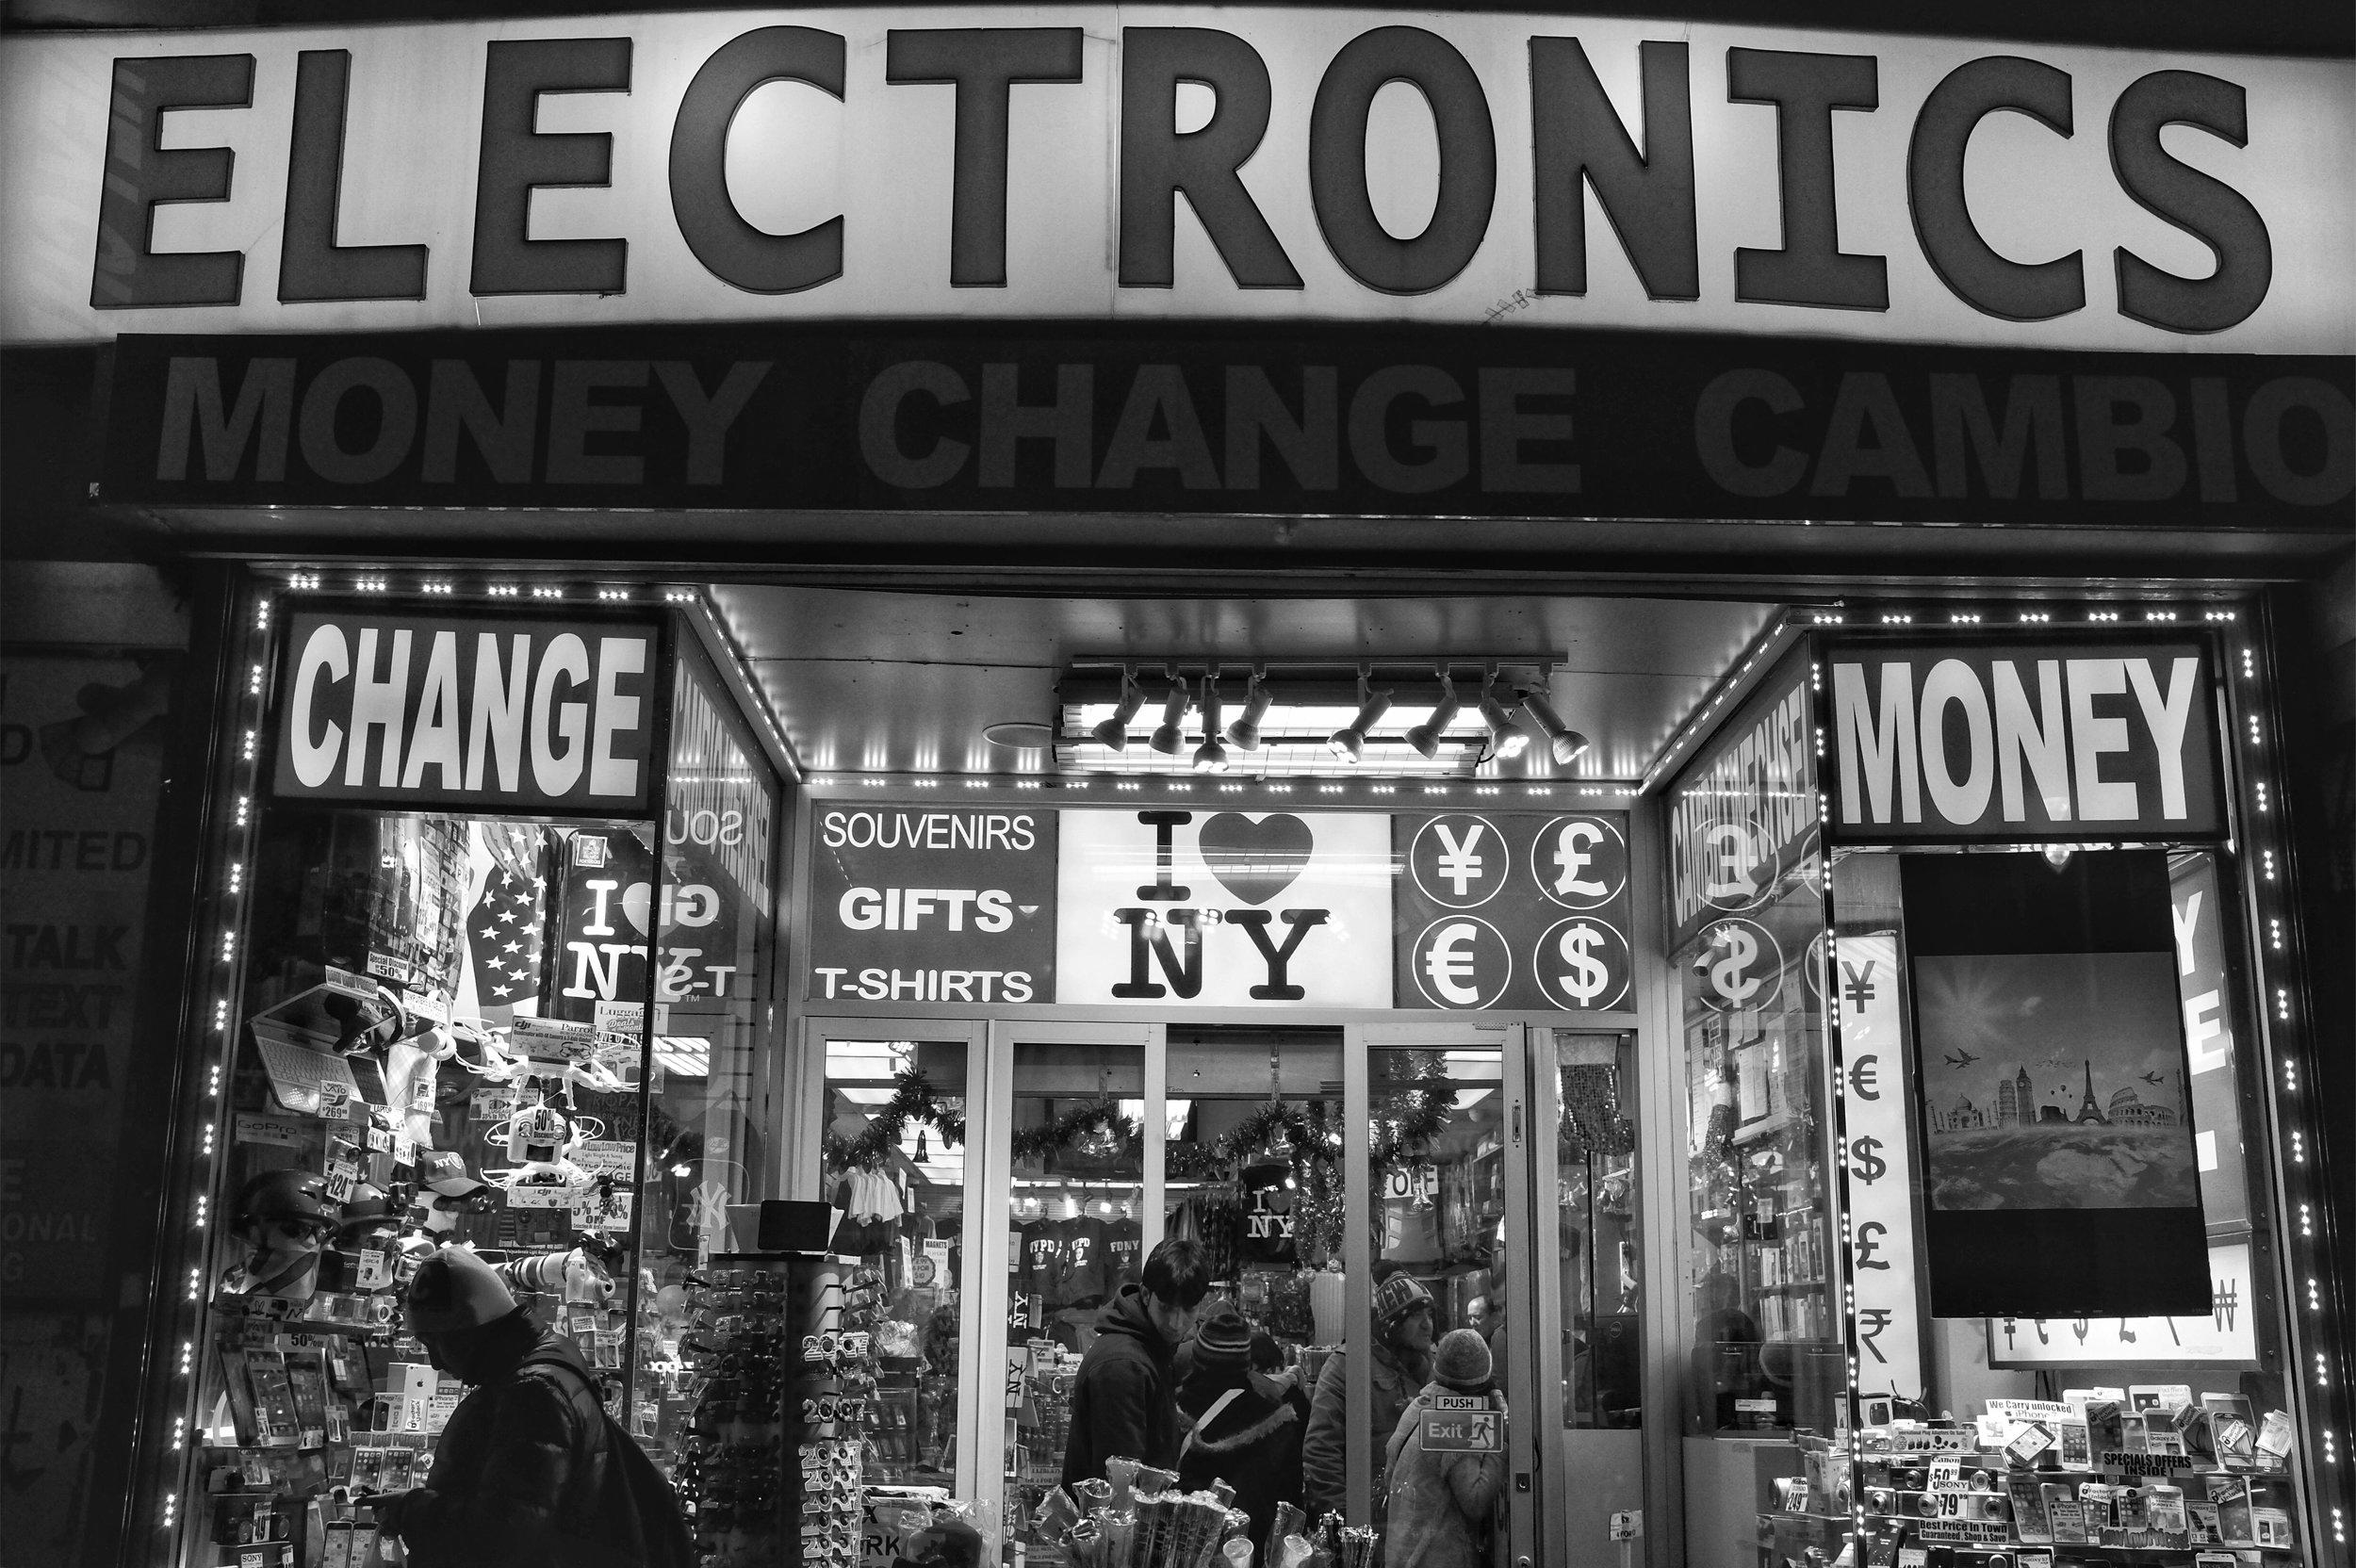 Electronics. 7th Ave. New York City. 2016